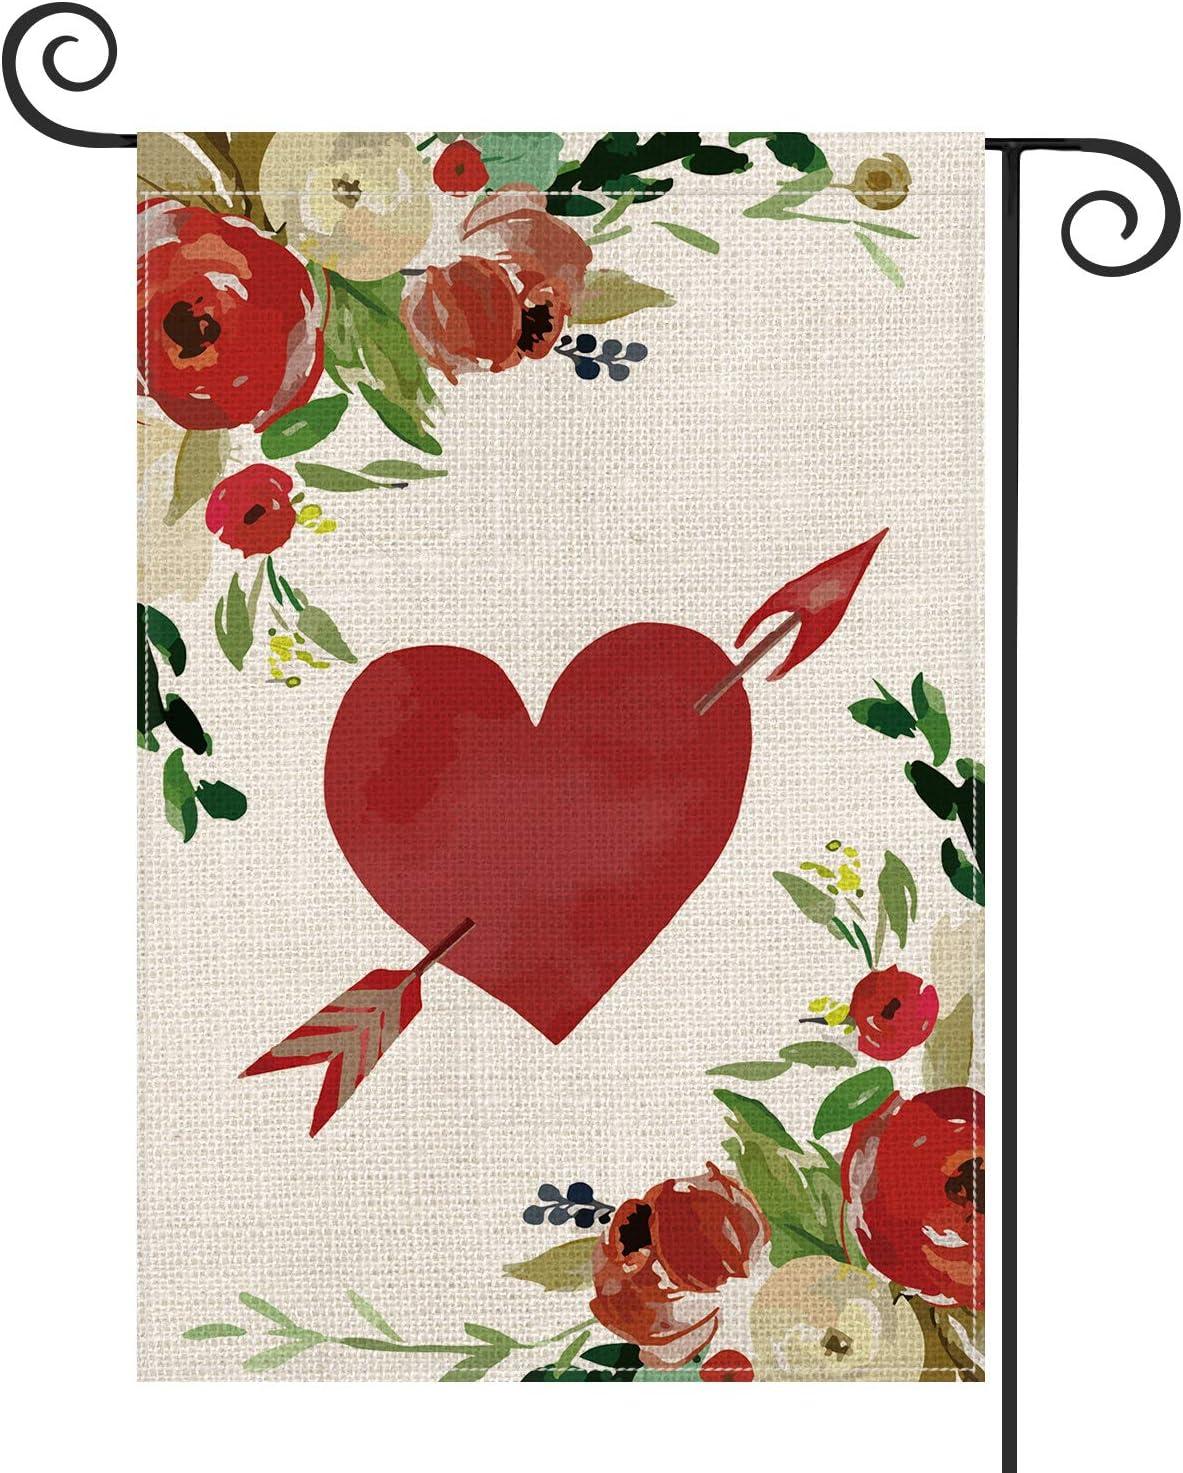 AVOIN Love Heart Arrow Garden Flag Vertical Double Sized, Flowers Rose Holiday Valentine's Day Wedding Farmhouse Yard Outdoor Decoration 12.5 x 18 Inch